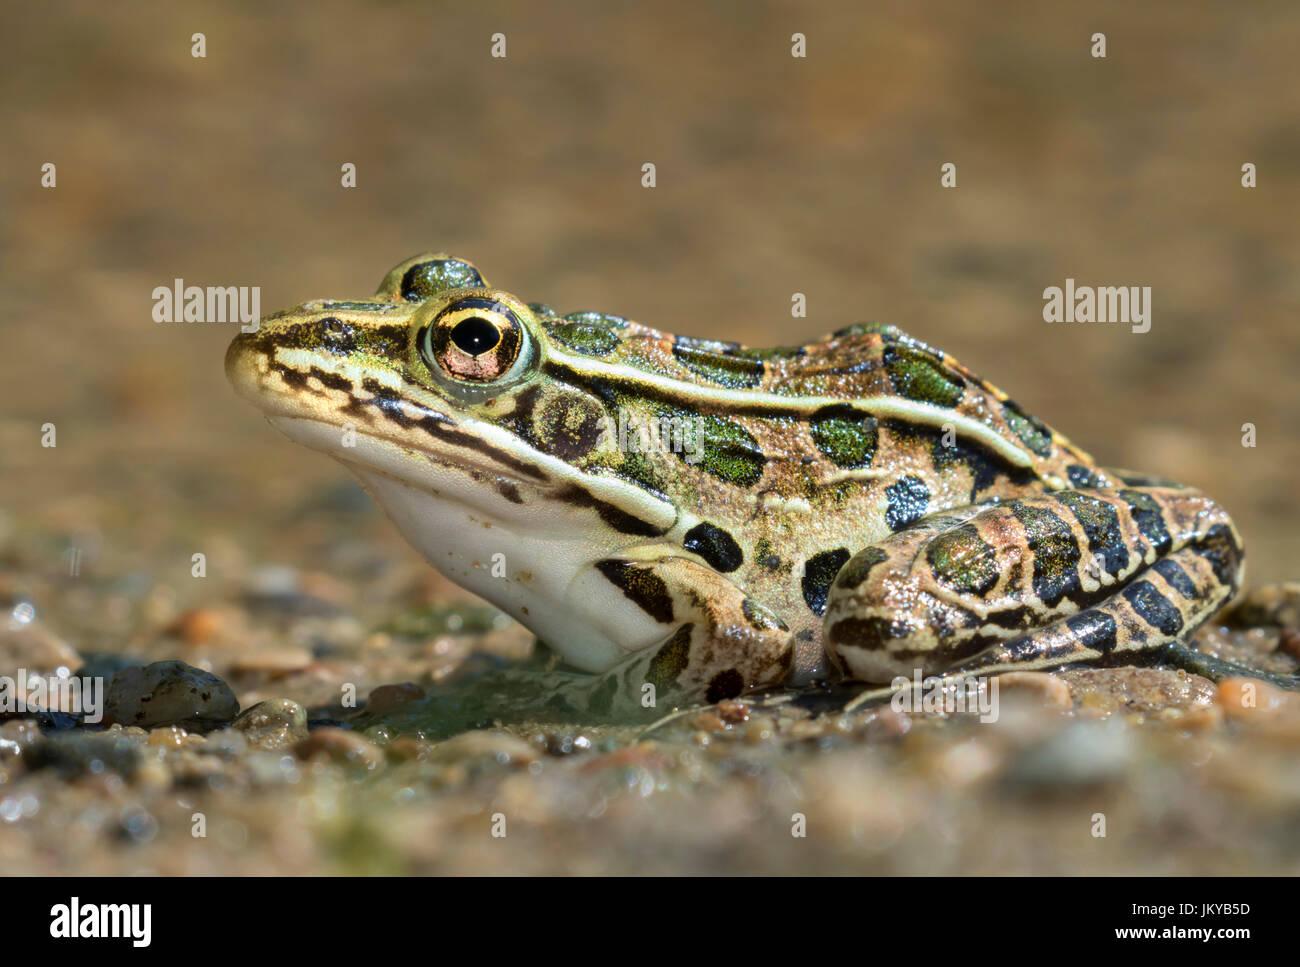 Northern leopard frog (Lithobates pipiens) near water stream, Ledges State Park, Iowa, USA. Stock Photo